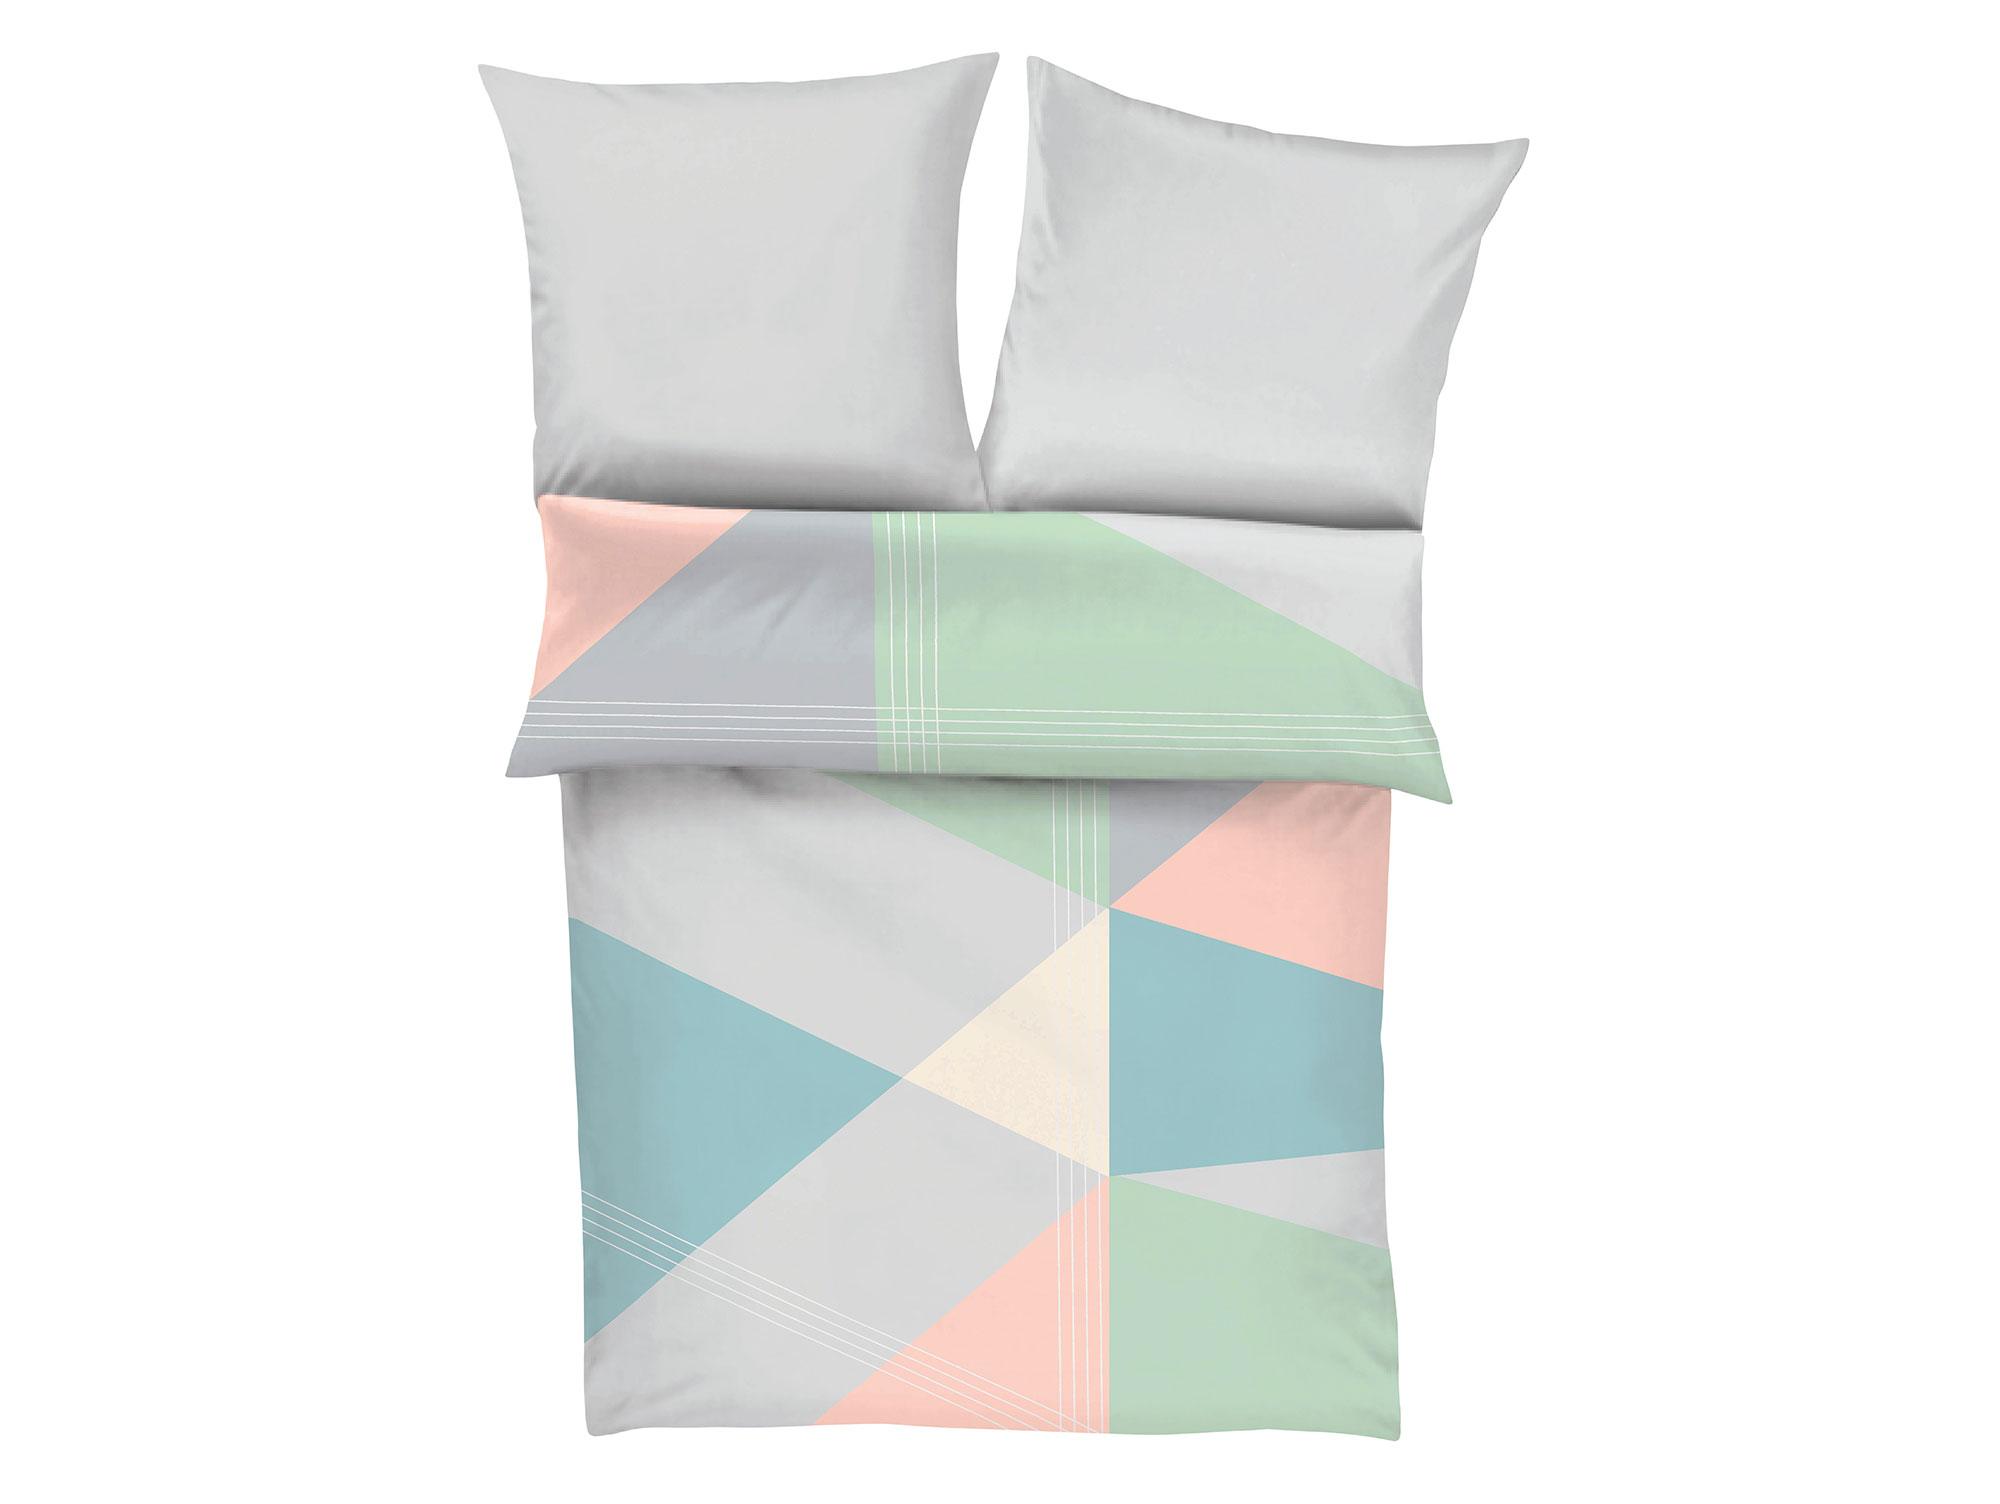 s oliver mako satin bettw sche 135x200 80x80 pastell bunt. Black Bedroom Furniture Sets. Home Design Ideas